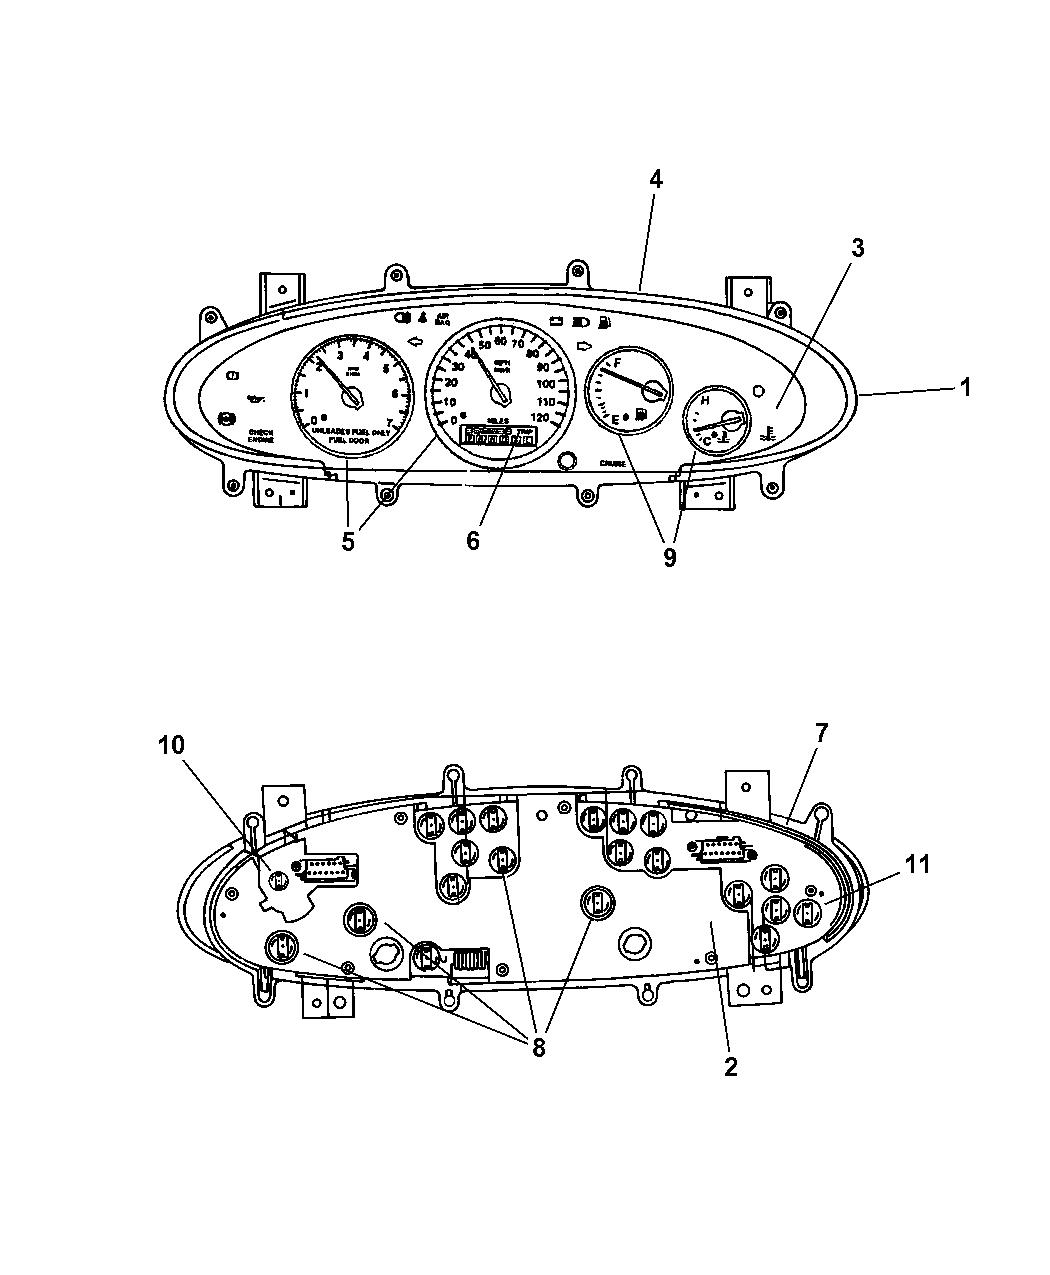 1998 Chrysler Sebring Convertible Cluster, Instrument Panel